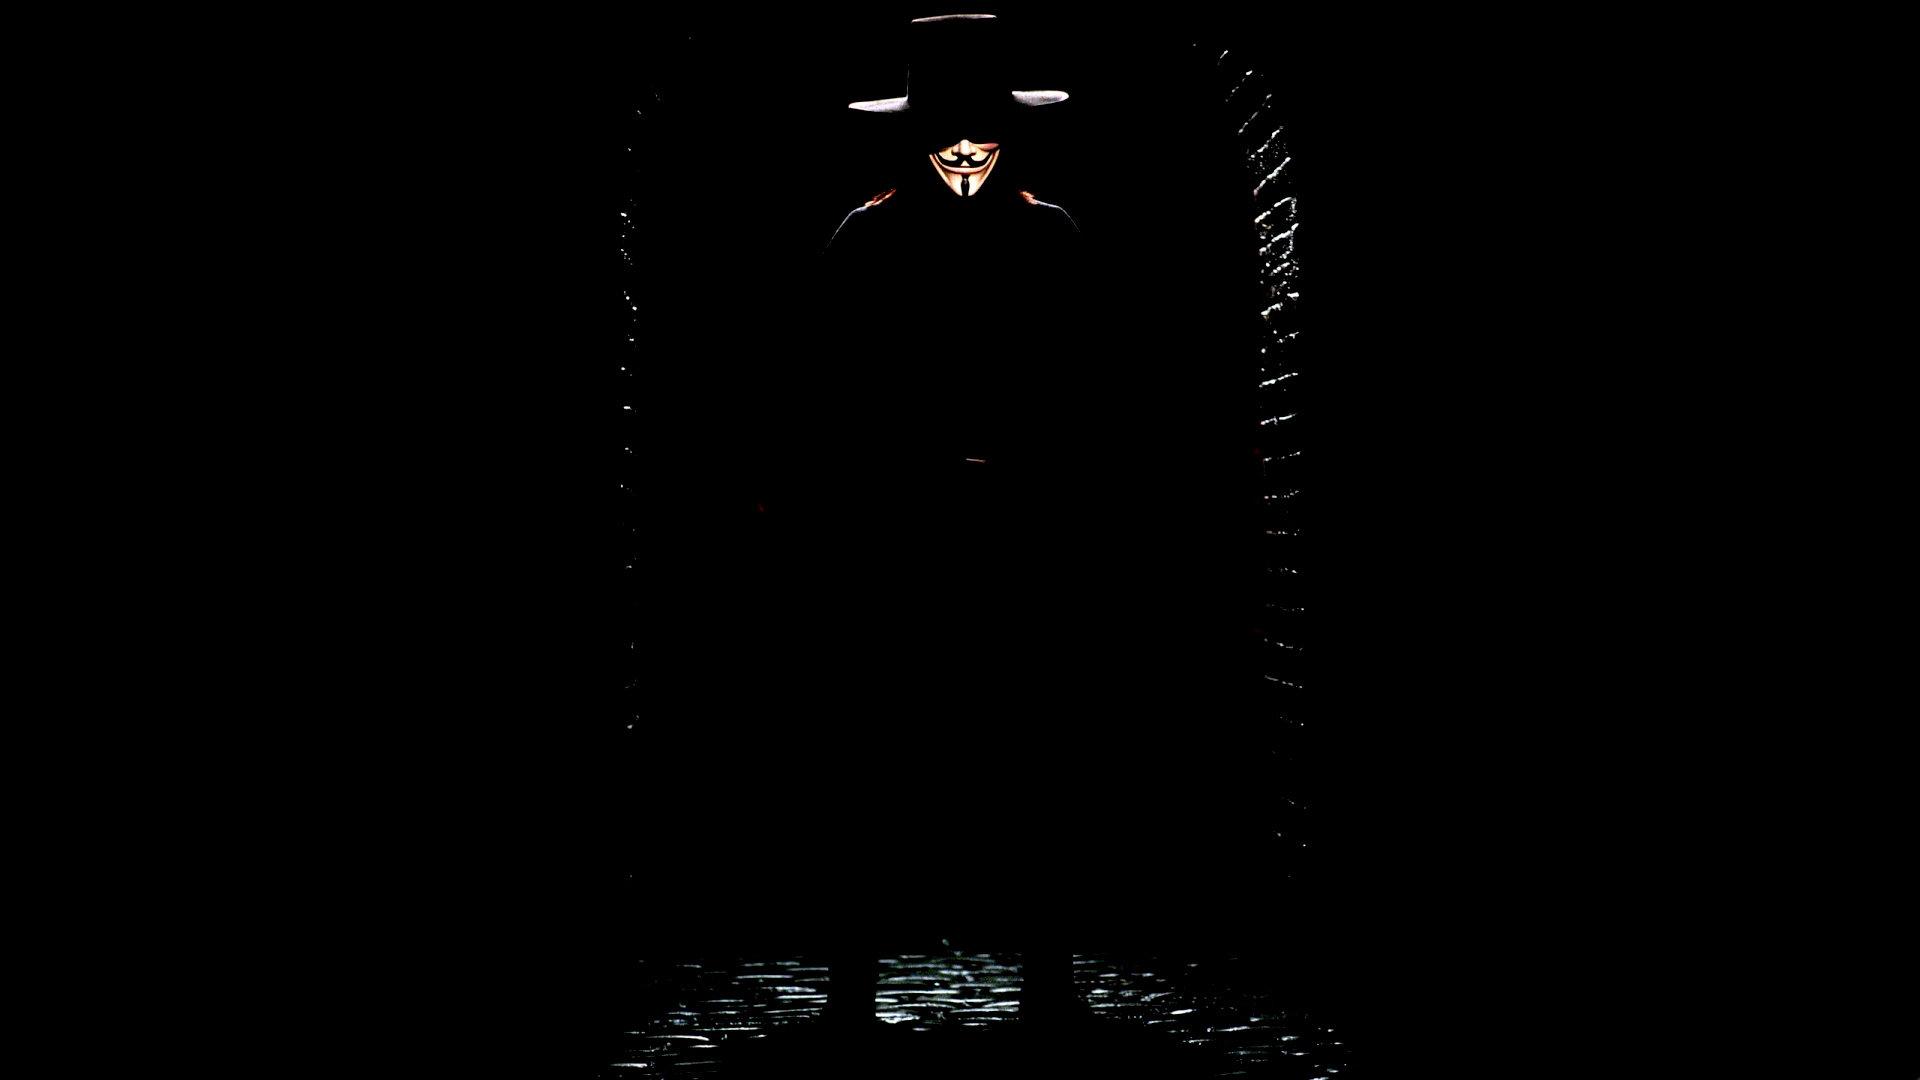 Free Download V For Vendetta Wallpaper ID92203 Full Hd 1080p PC